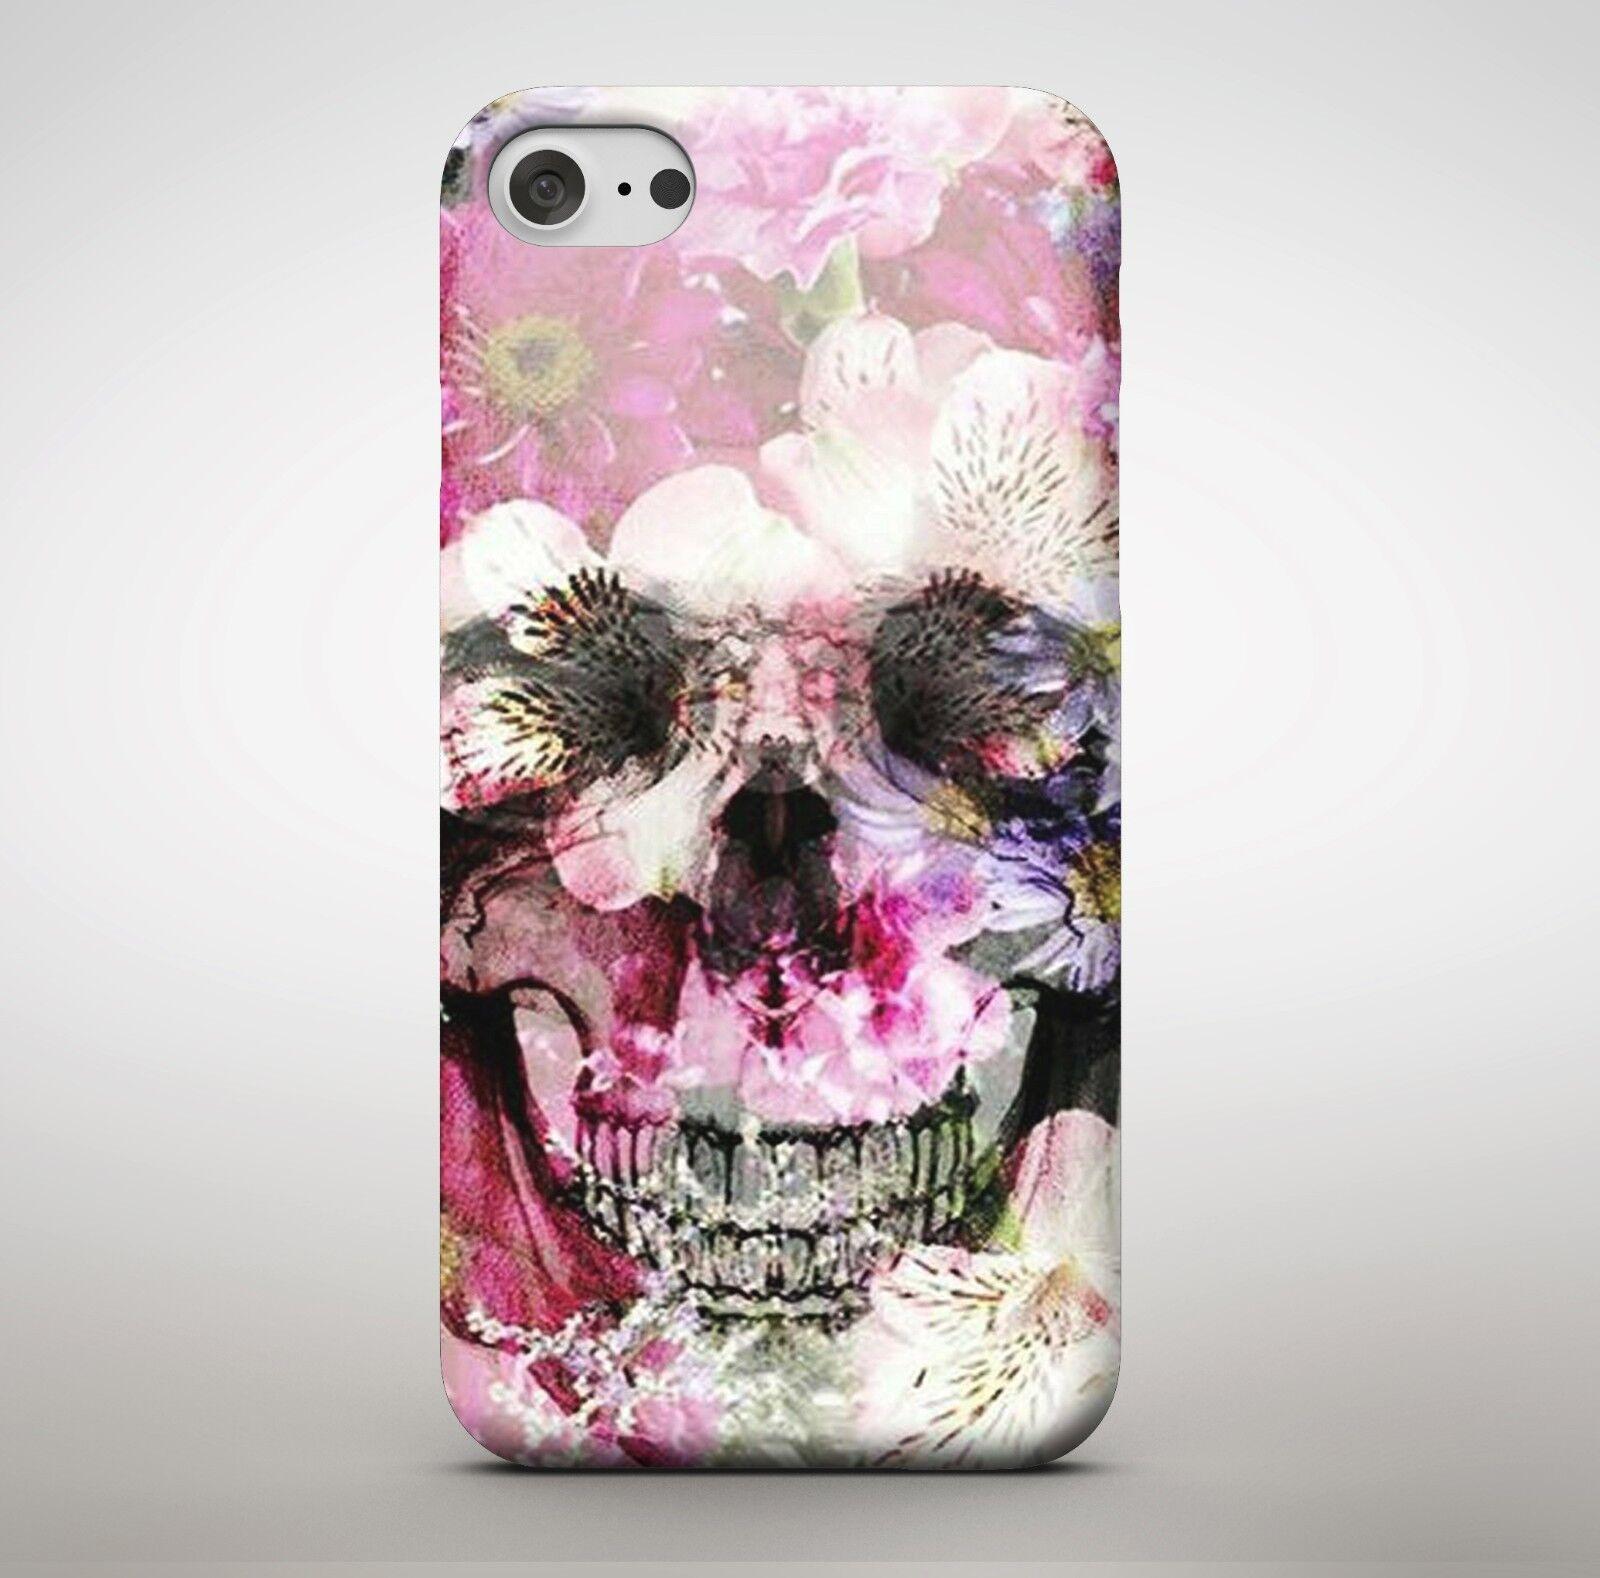 Floral flower skull skeleton artwork sugar pink petal colourful floral flower skull skeleton artwork sugar pink petal colourful phone case cover mightylinksfo